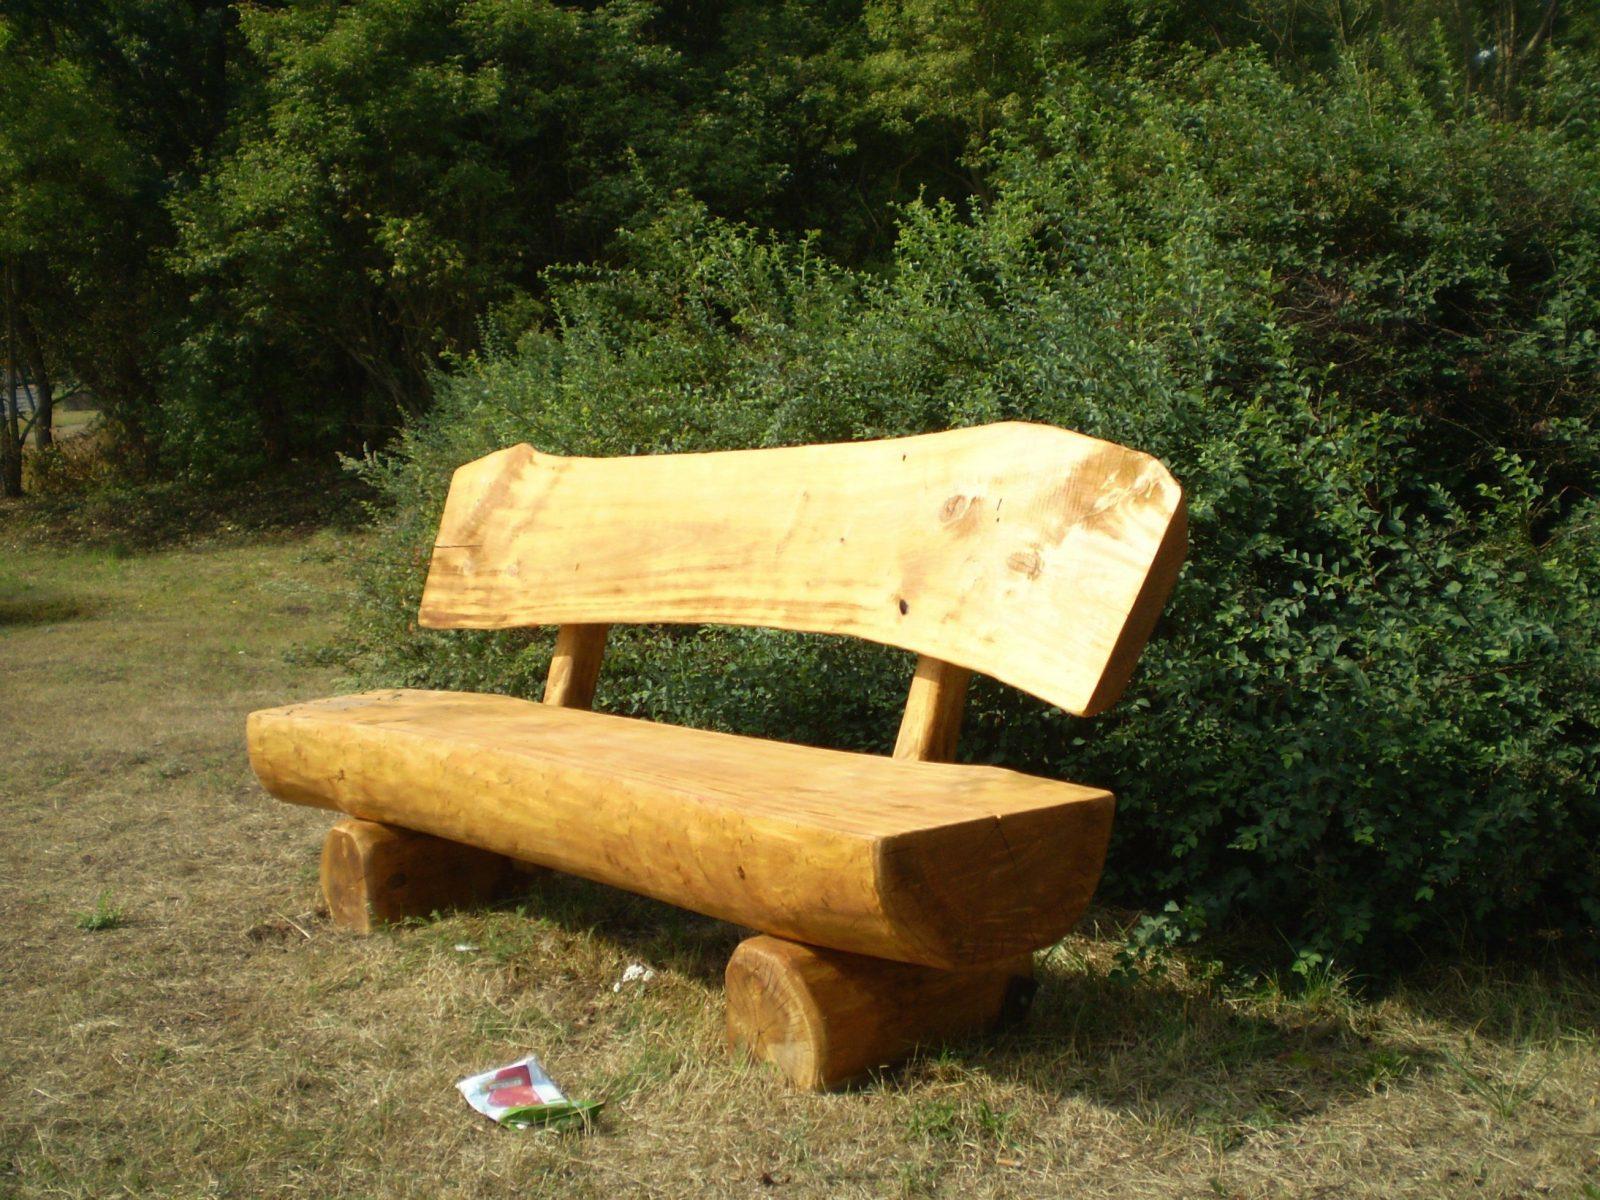 Holzbank Selber Bauen Rustikal Mit Rustikale Gartenmöbel Aus von Holzbank Selber Bauen Rustikal Bild